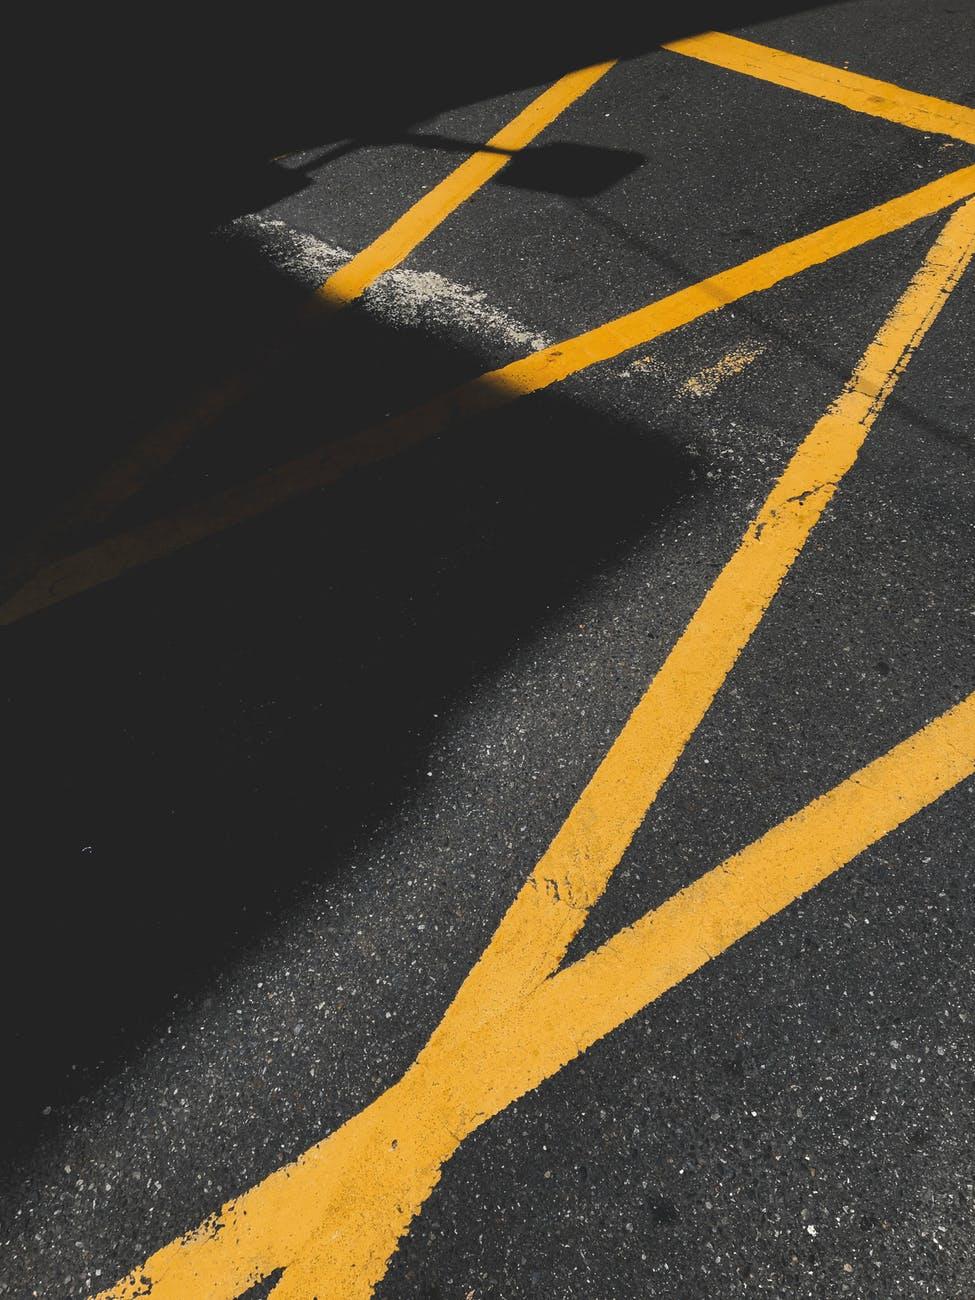 asphalt road with yellow lane